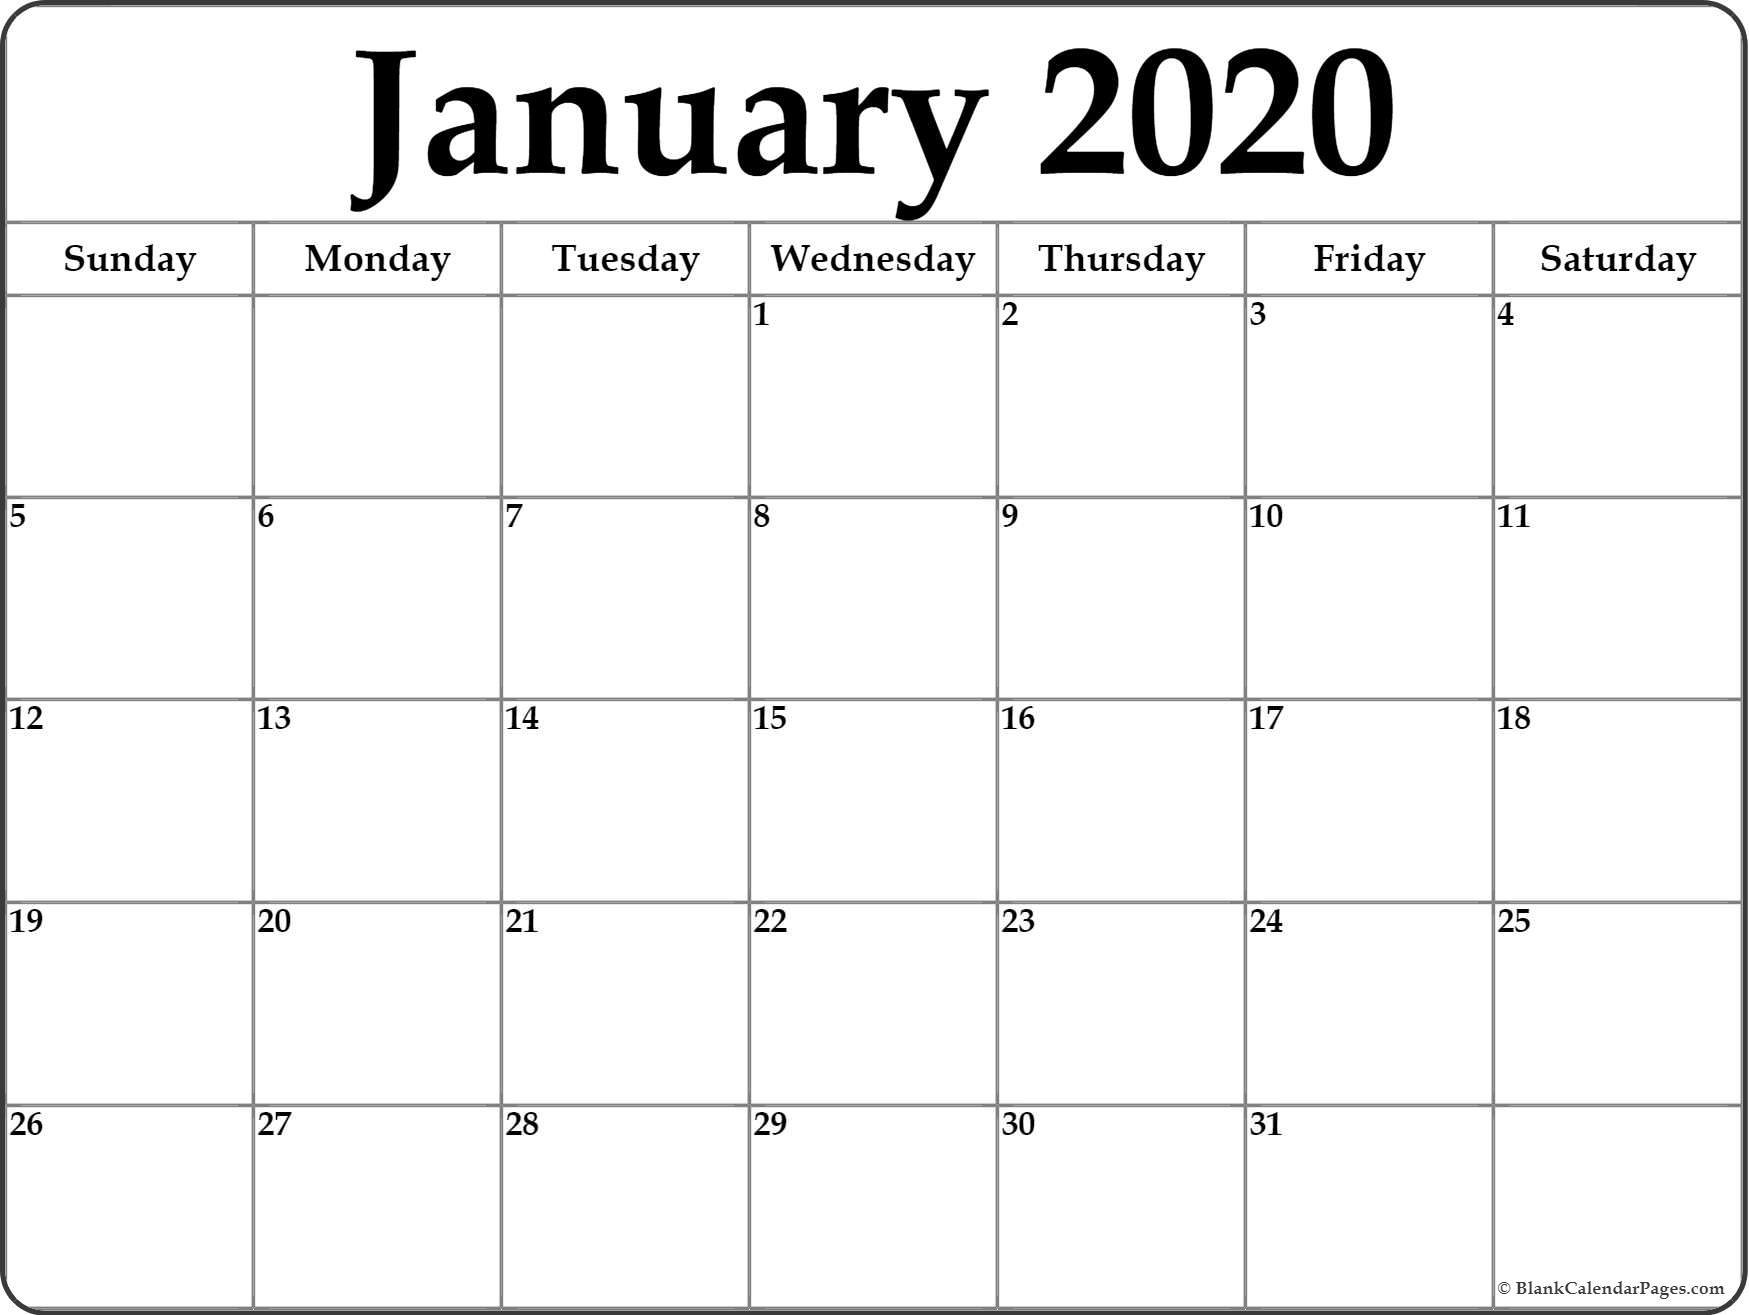 Monthly 2020 Calendar Printable January 2020 Blank Calendar